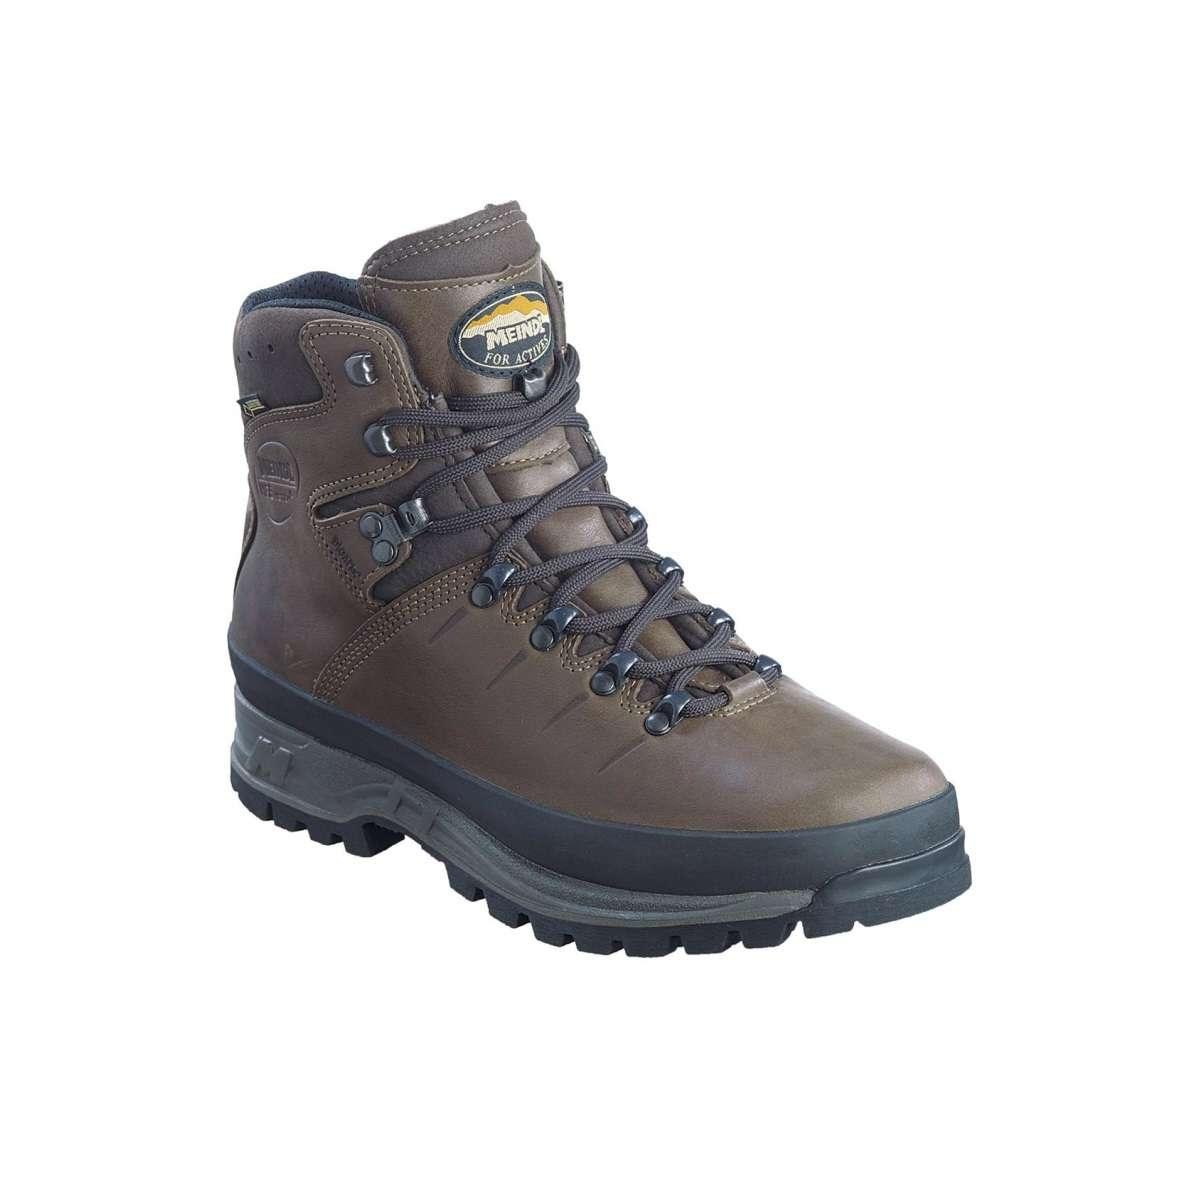 a767e16193f Meindl Men's Bhutan MFS GTX Walking Boot - Brown 11